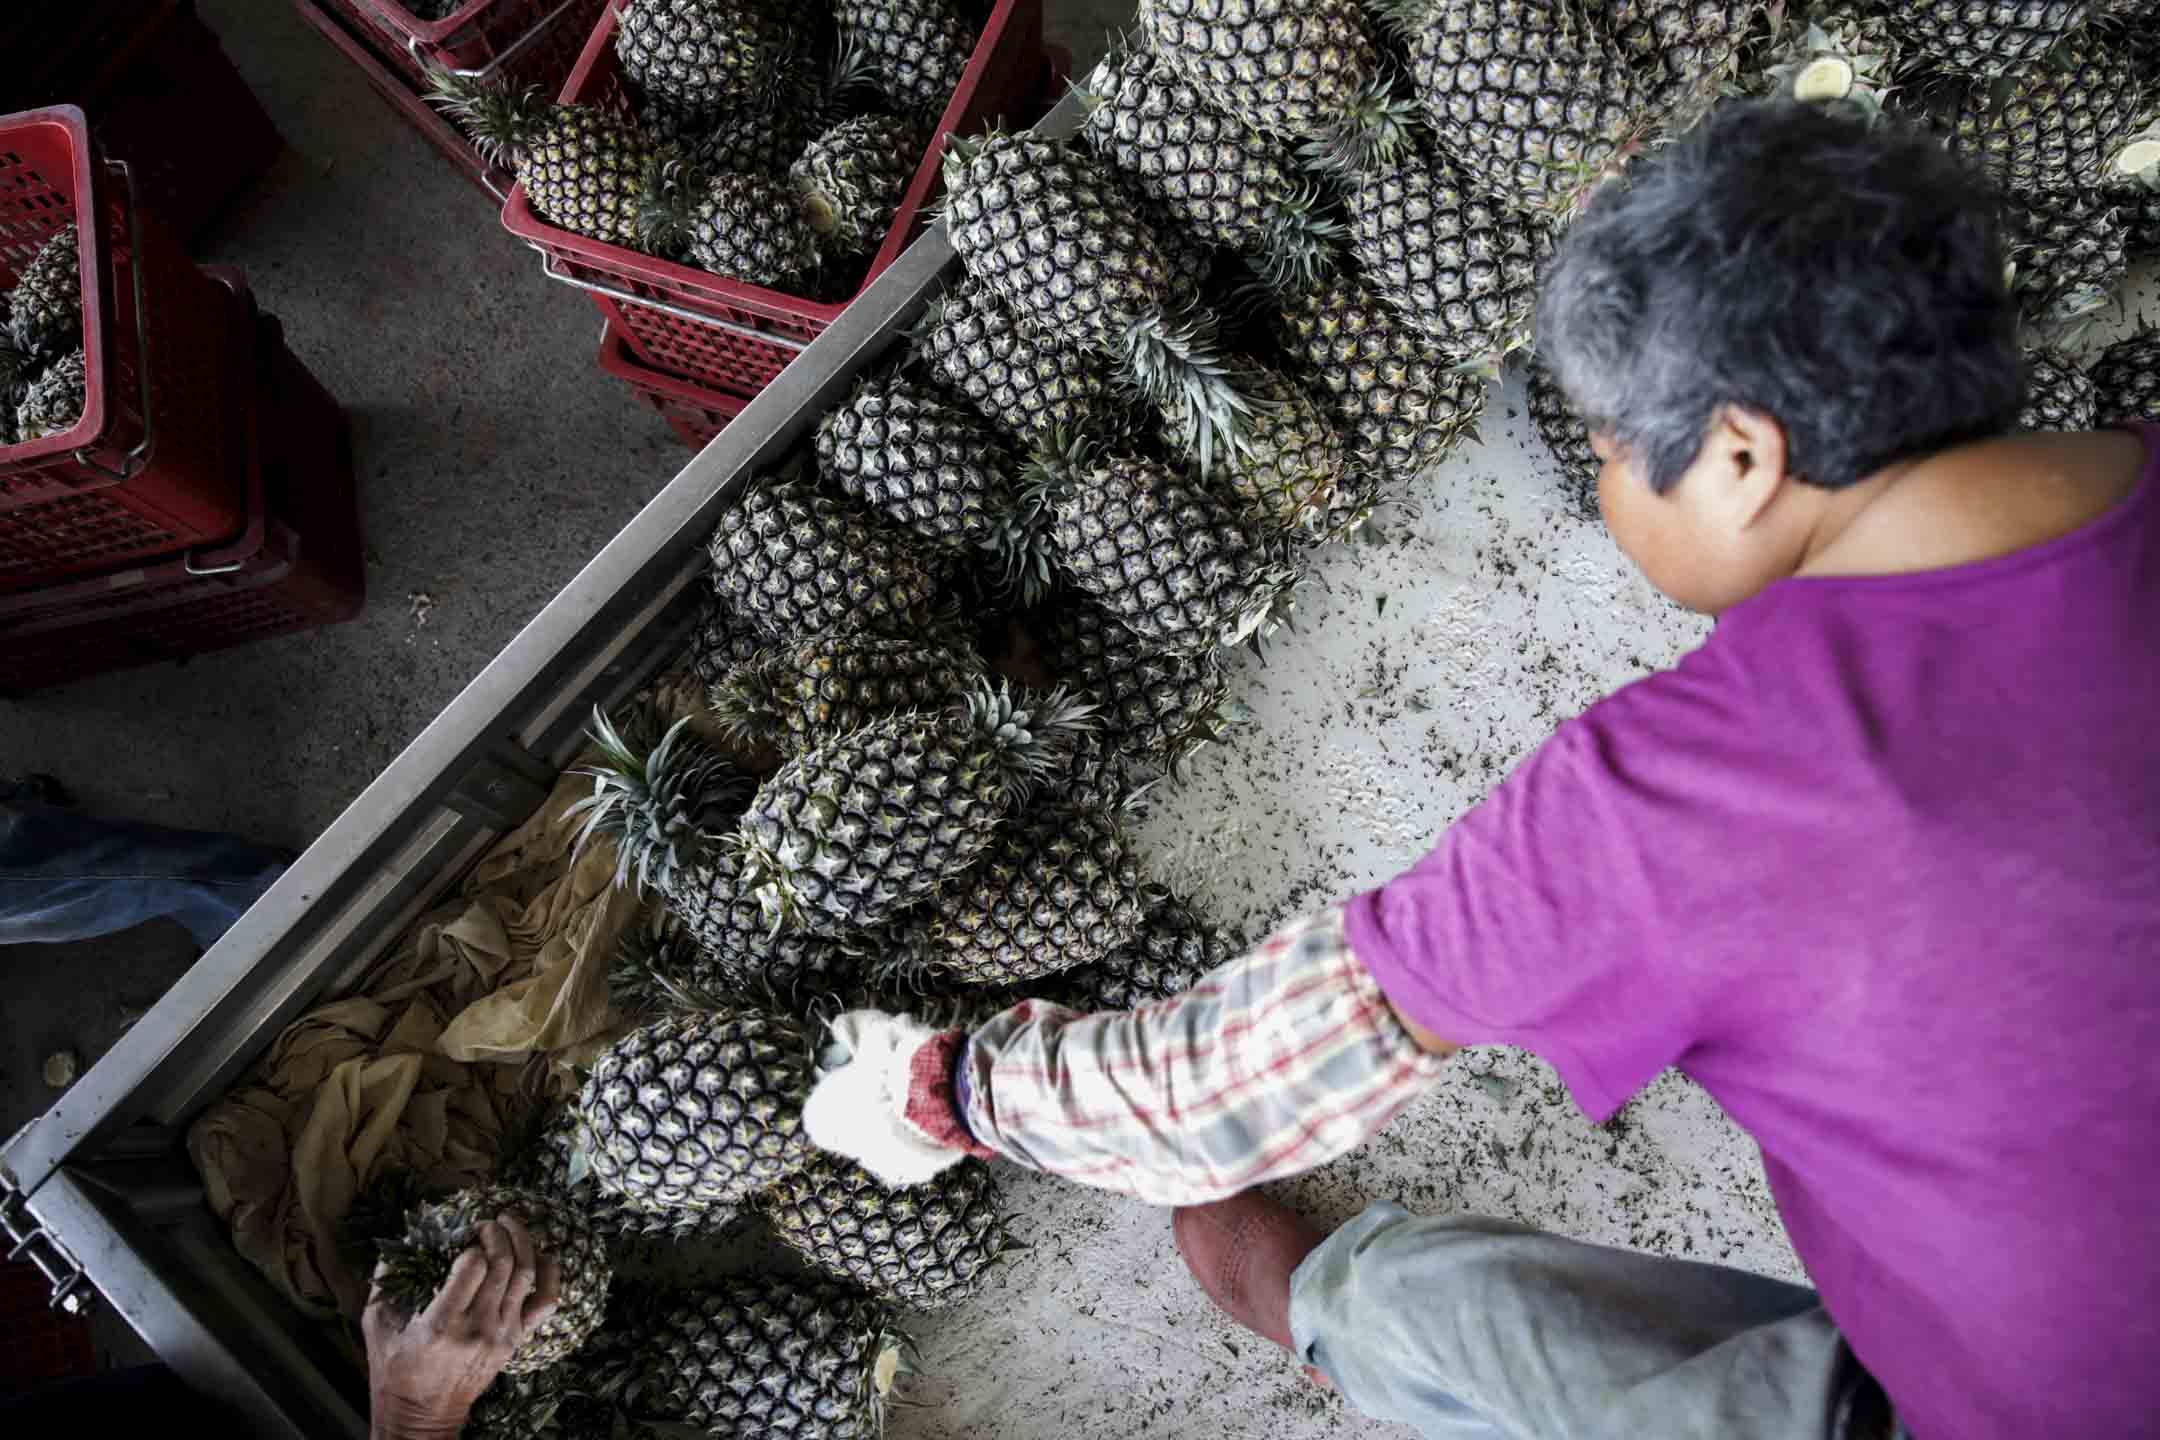 2021年3月4日,台灣南投縣的一個配送中心,農民從卡車上卸下收穫的鳳梨。 攝:I-Hwa Cheng/Bloomberg via Getty Images